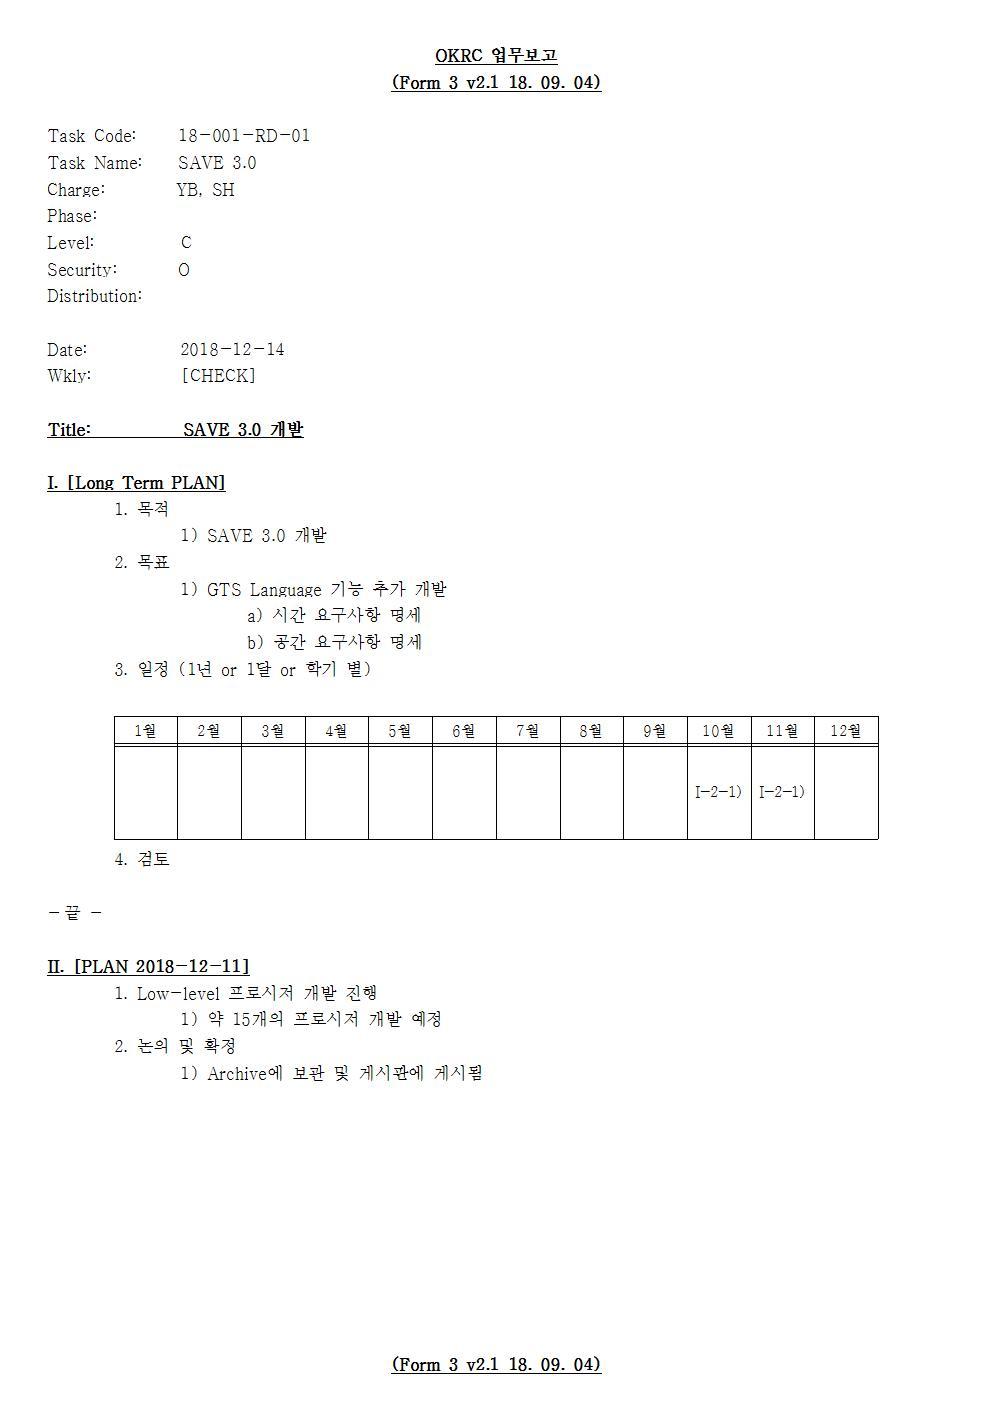 D-[18-001-RD-01]-[SAVE 3.0]-[2018-12-17][SH]001.jpg